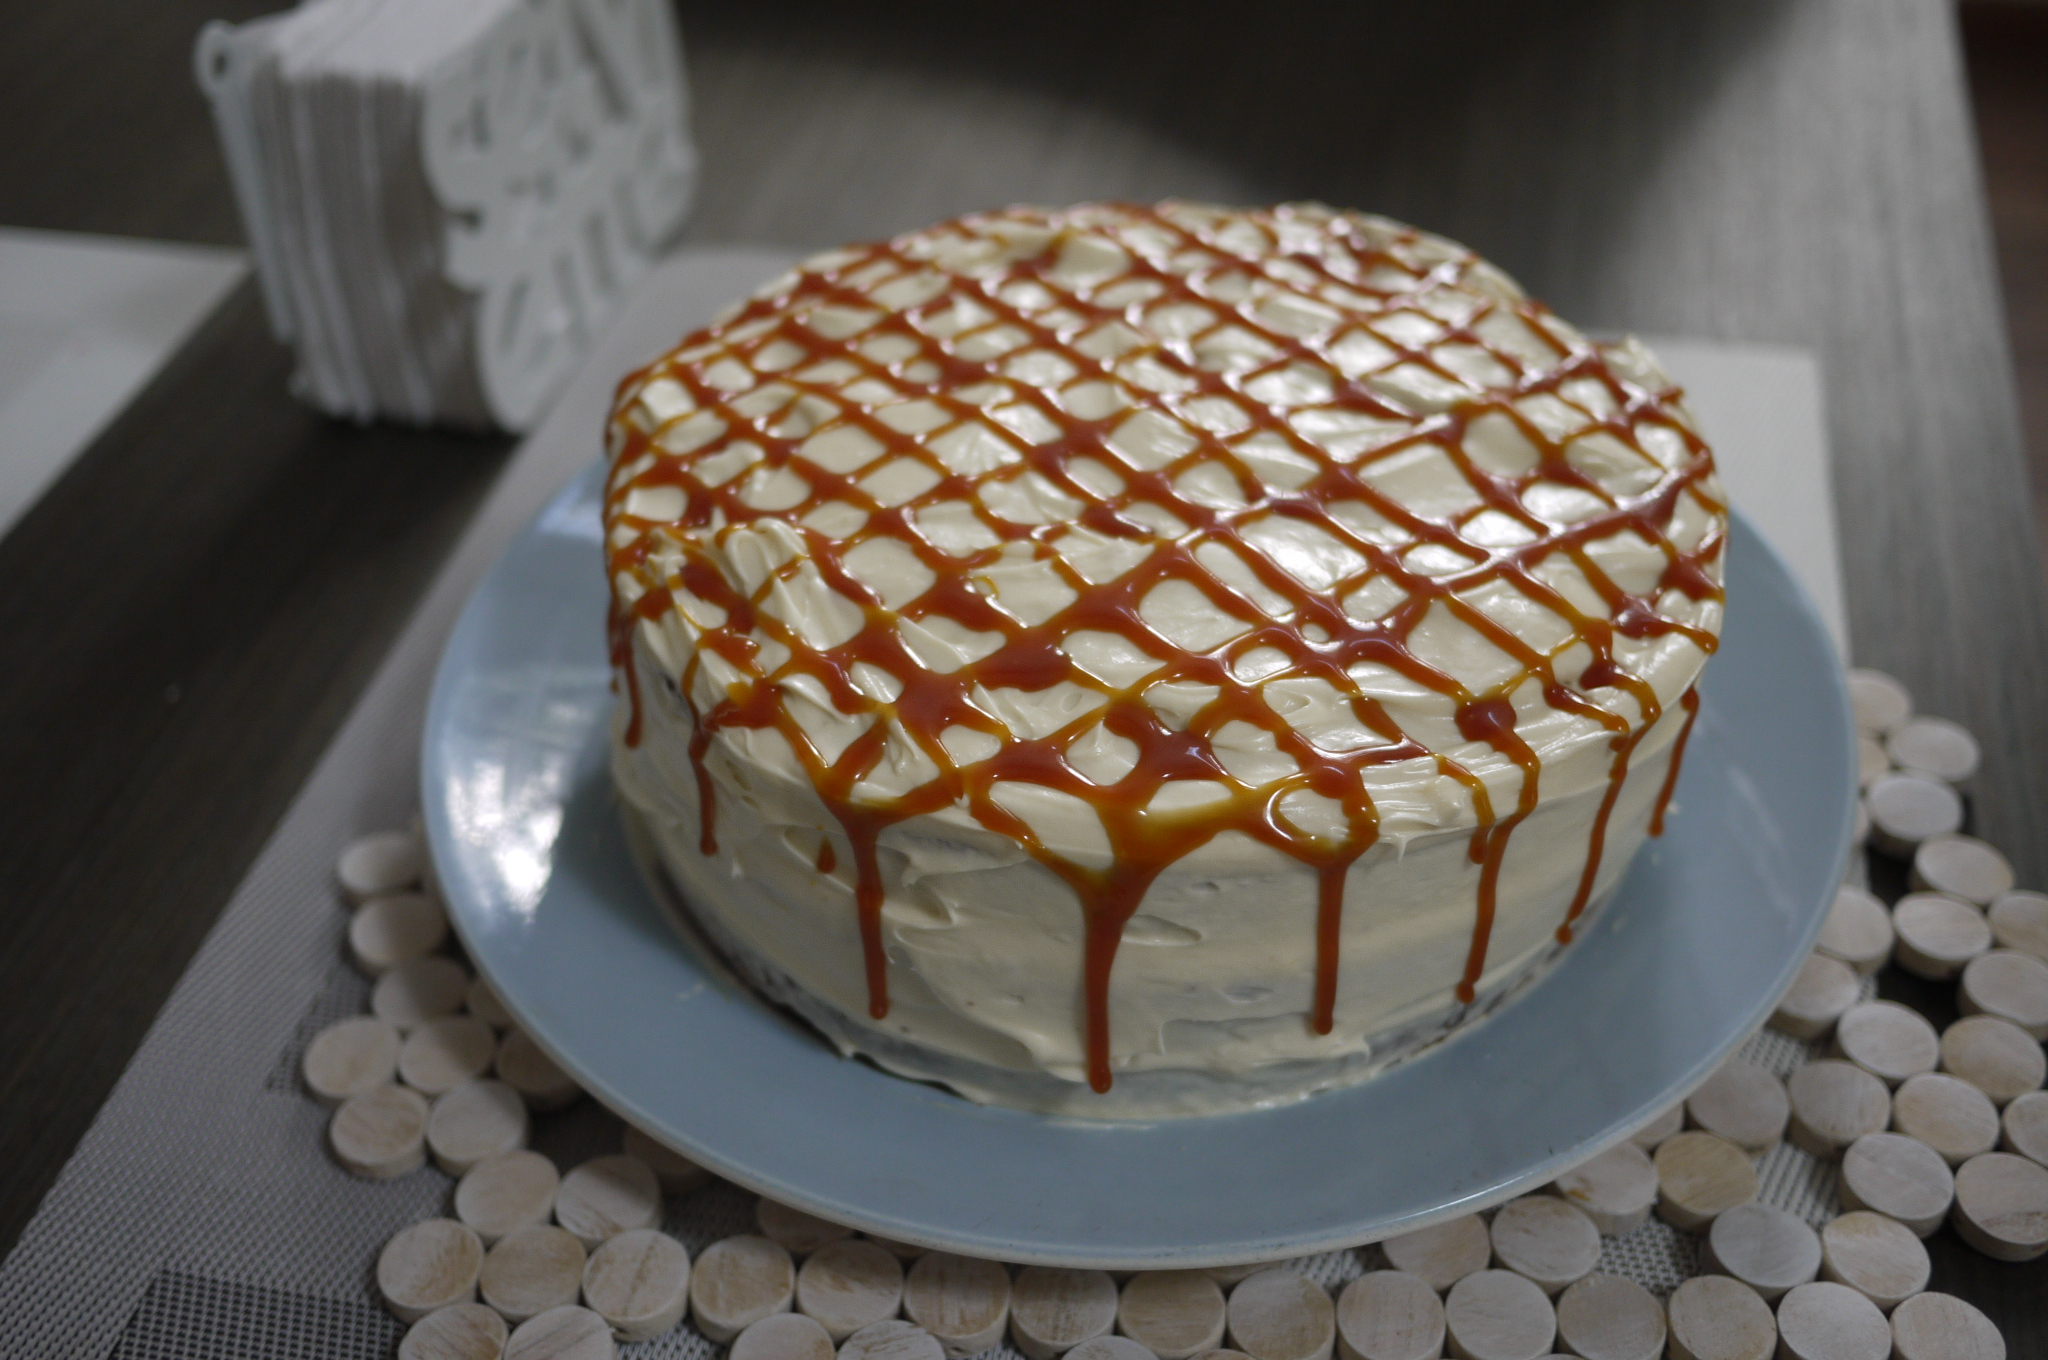 El mejor pastel de zanahoria the cute kitchen - Dulce de zanahoria ...